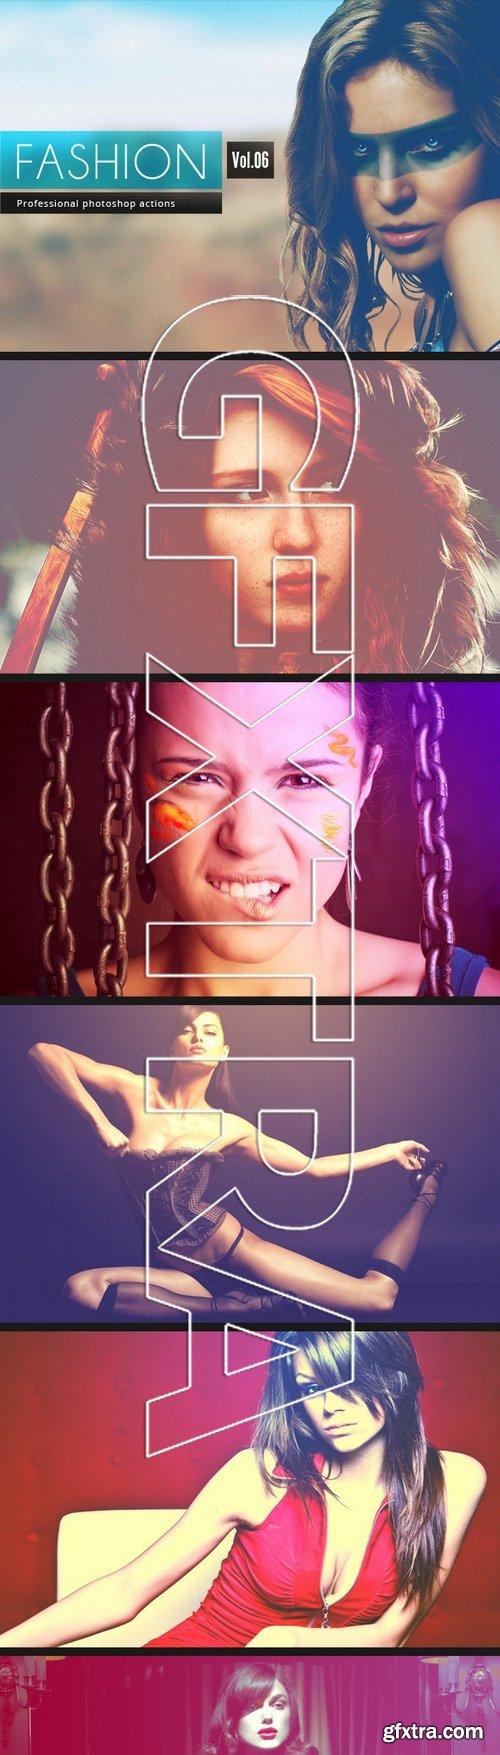 GraphicRiver - Fashion - Photoshop Actions [Vol.6] 11556235